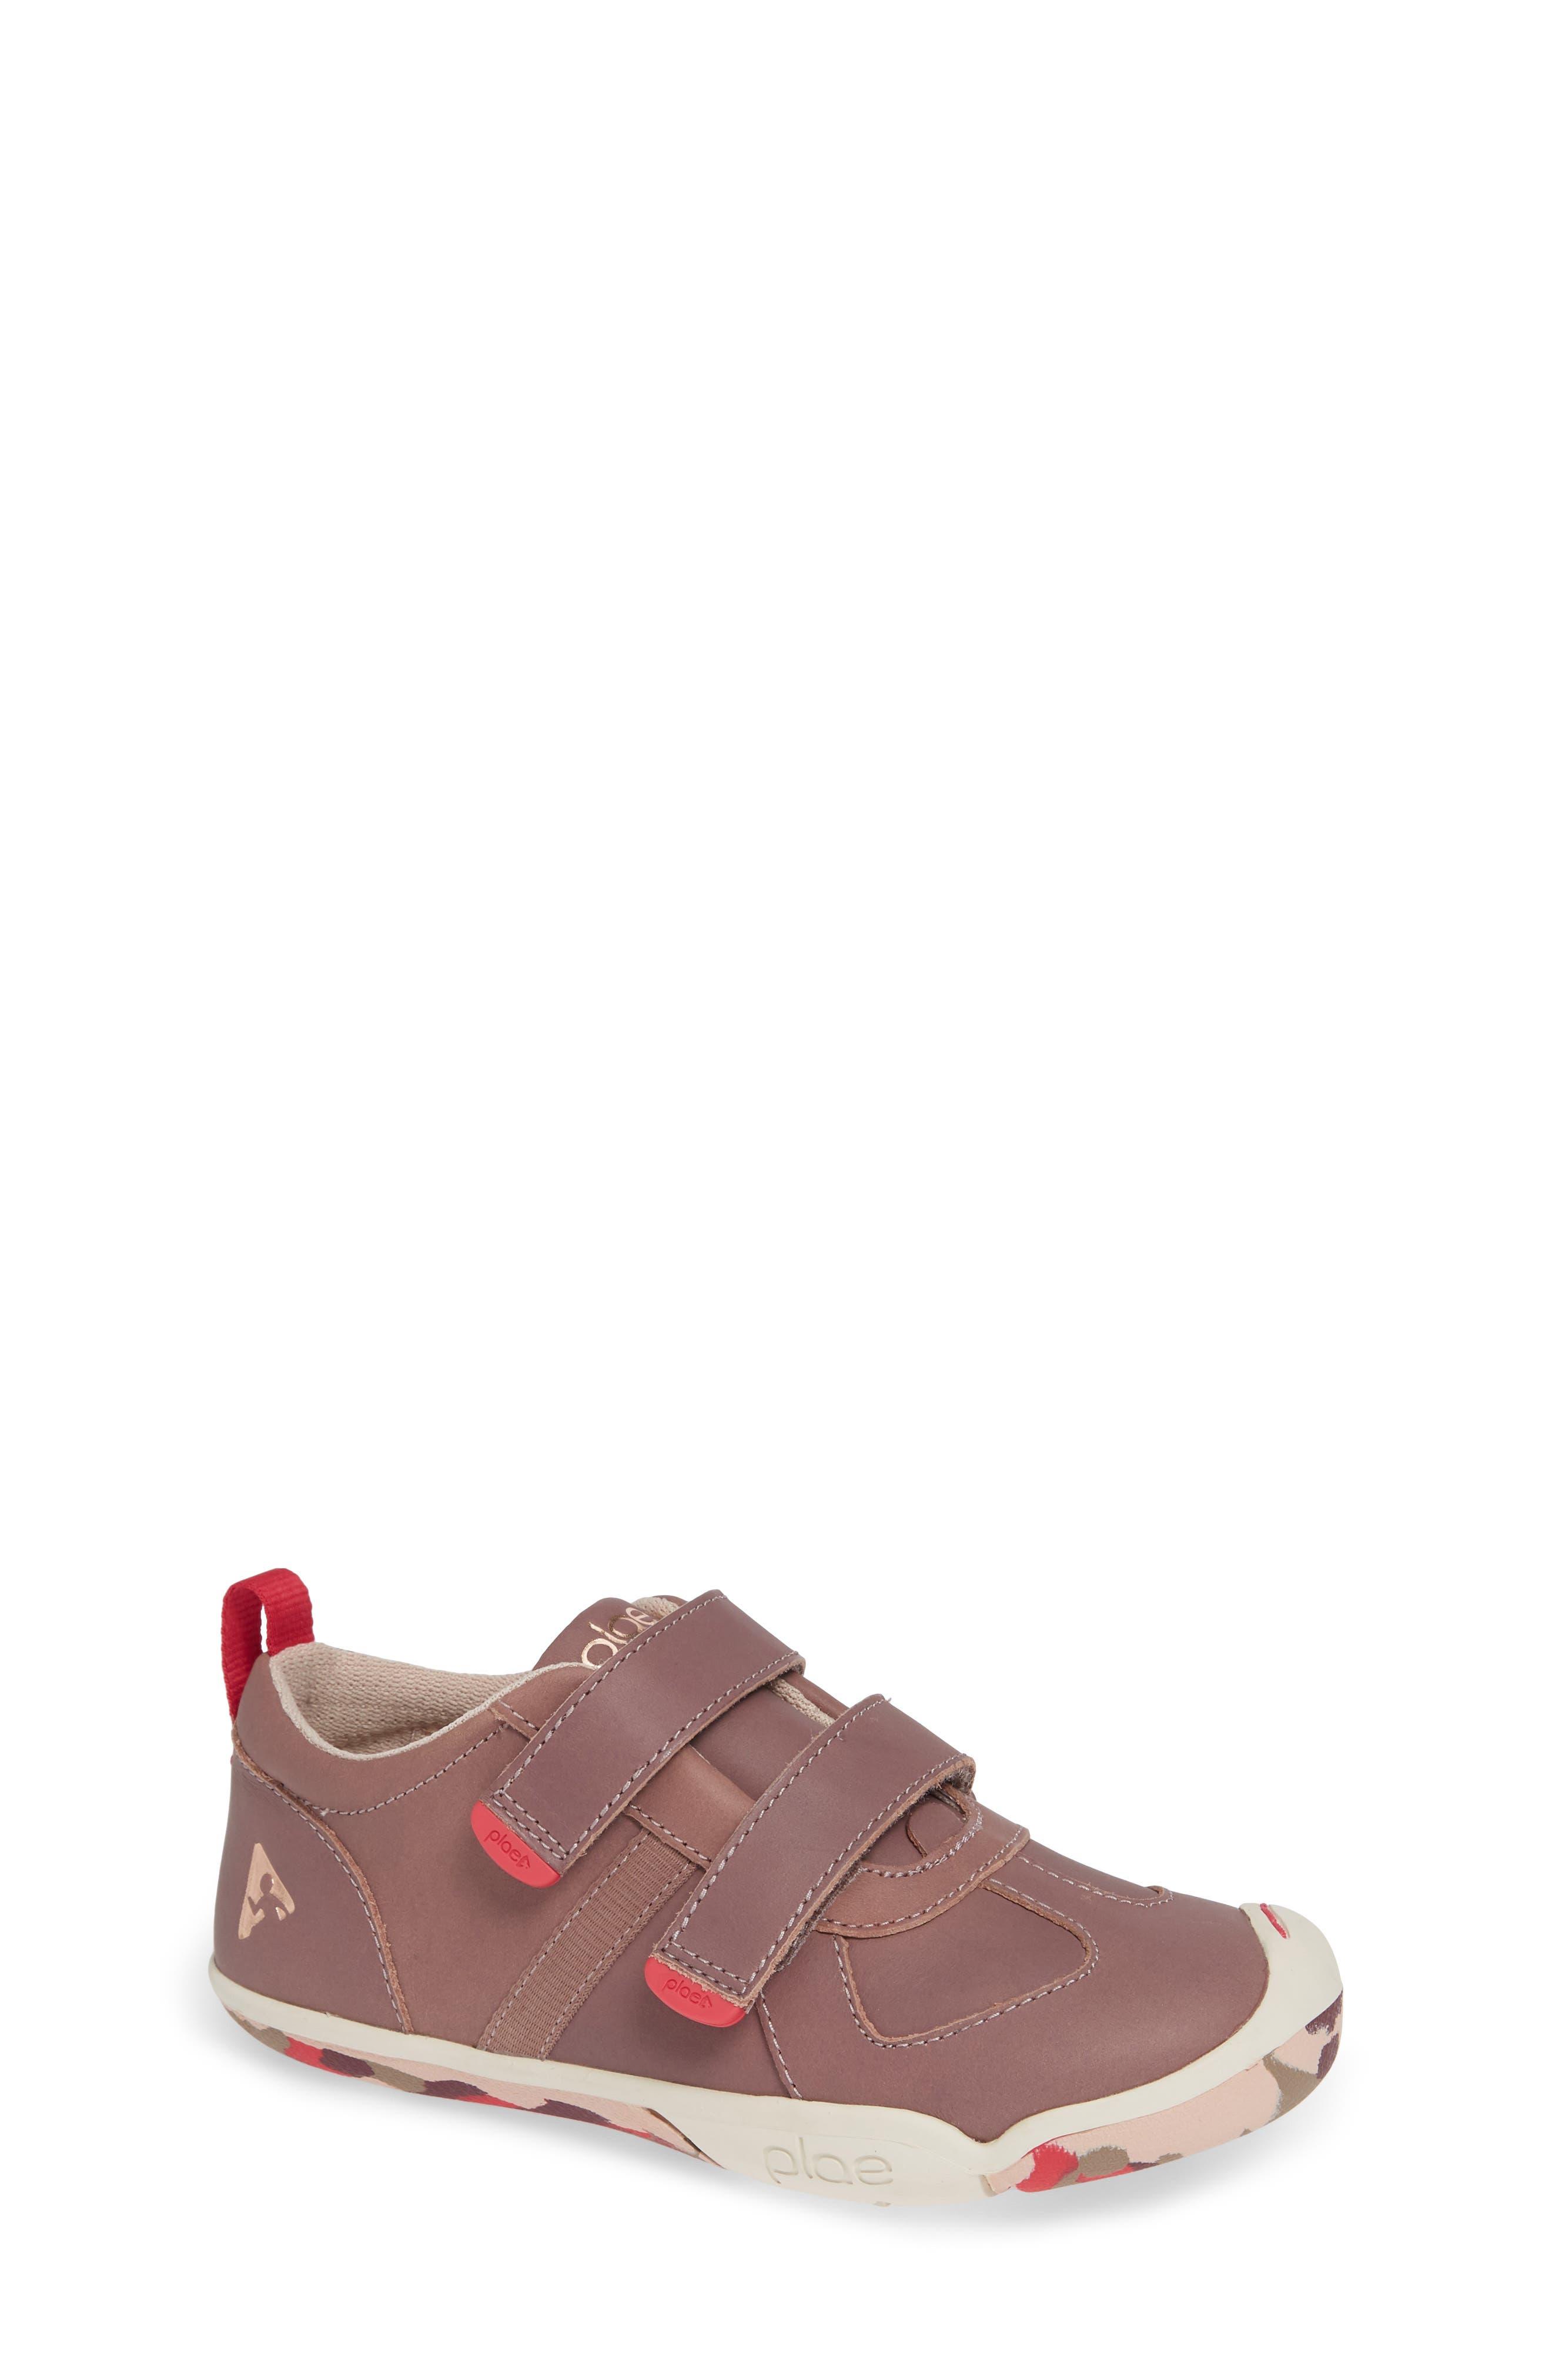 Nat Customizable Sneaker,                             Main thumbnail 1, color,                             SILTSTONE